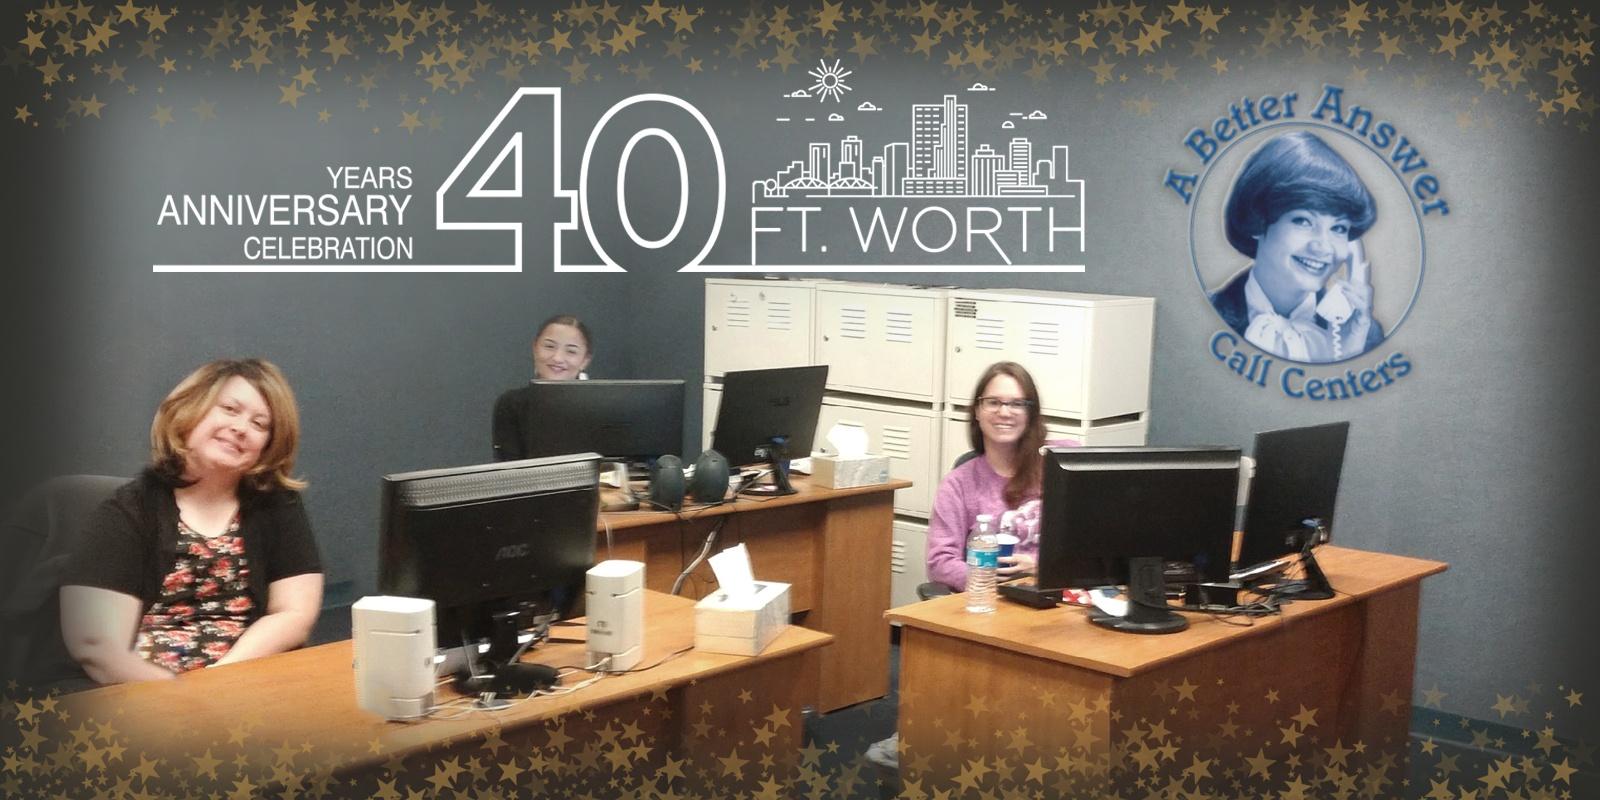 40 Wonderful Years in Fort Worth, Texas